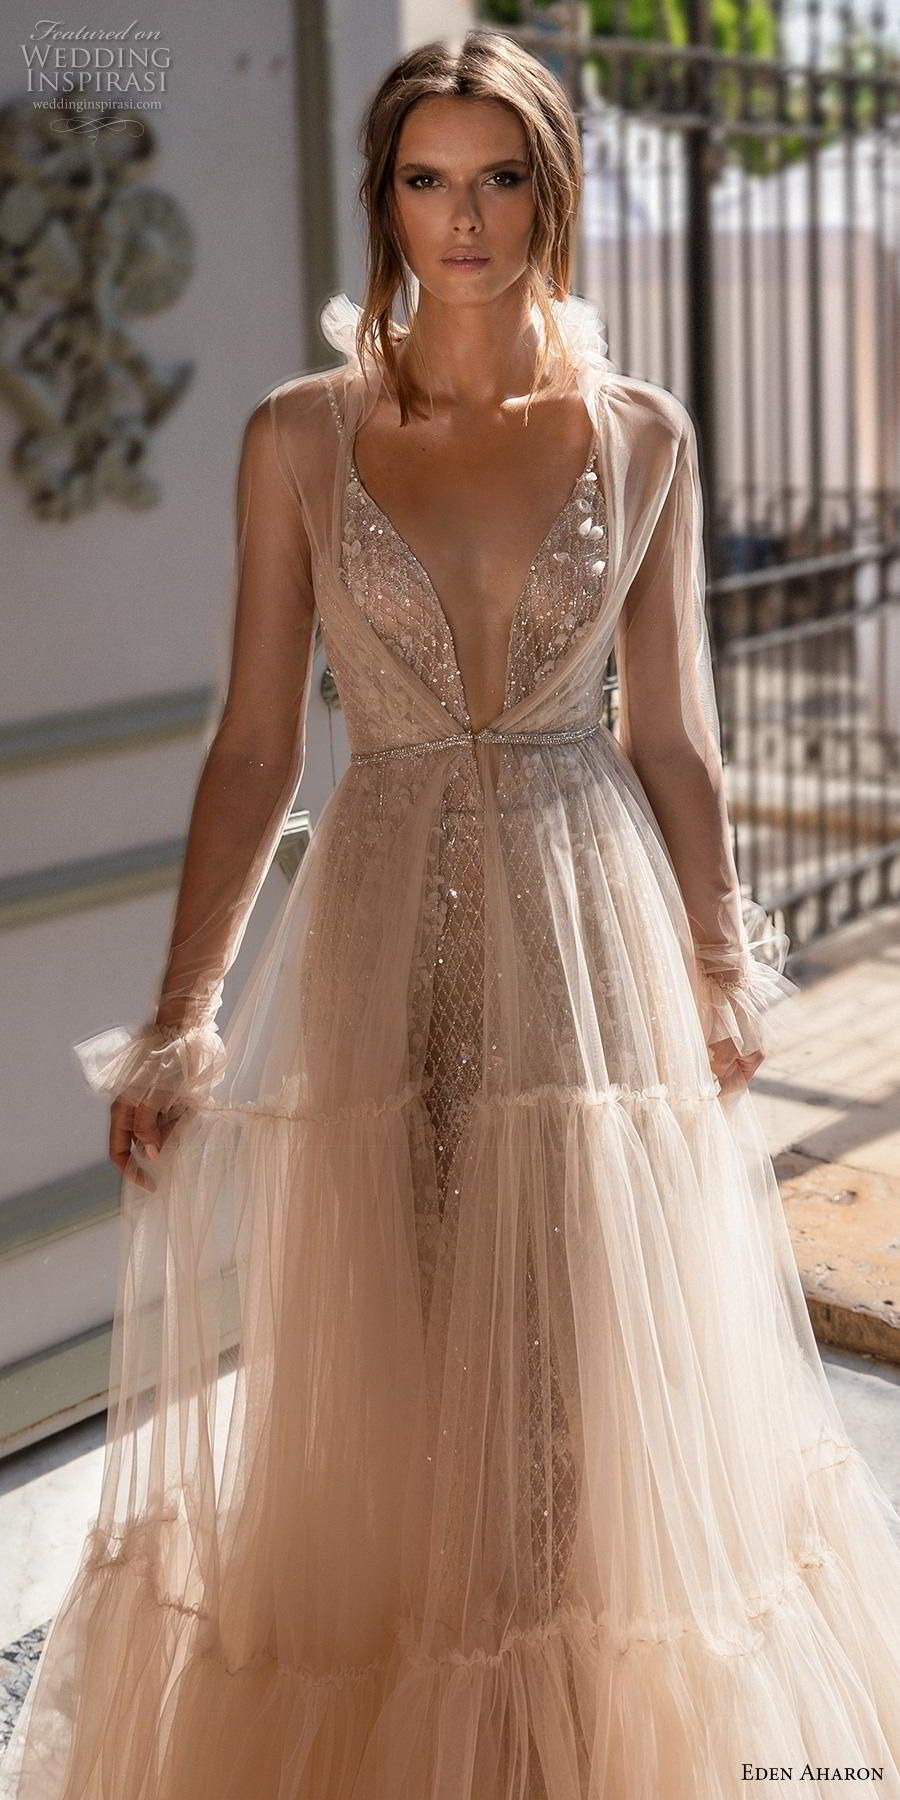 Eden aharon wedding dresses u ucbroadwayud bridal collection in